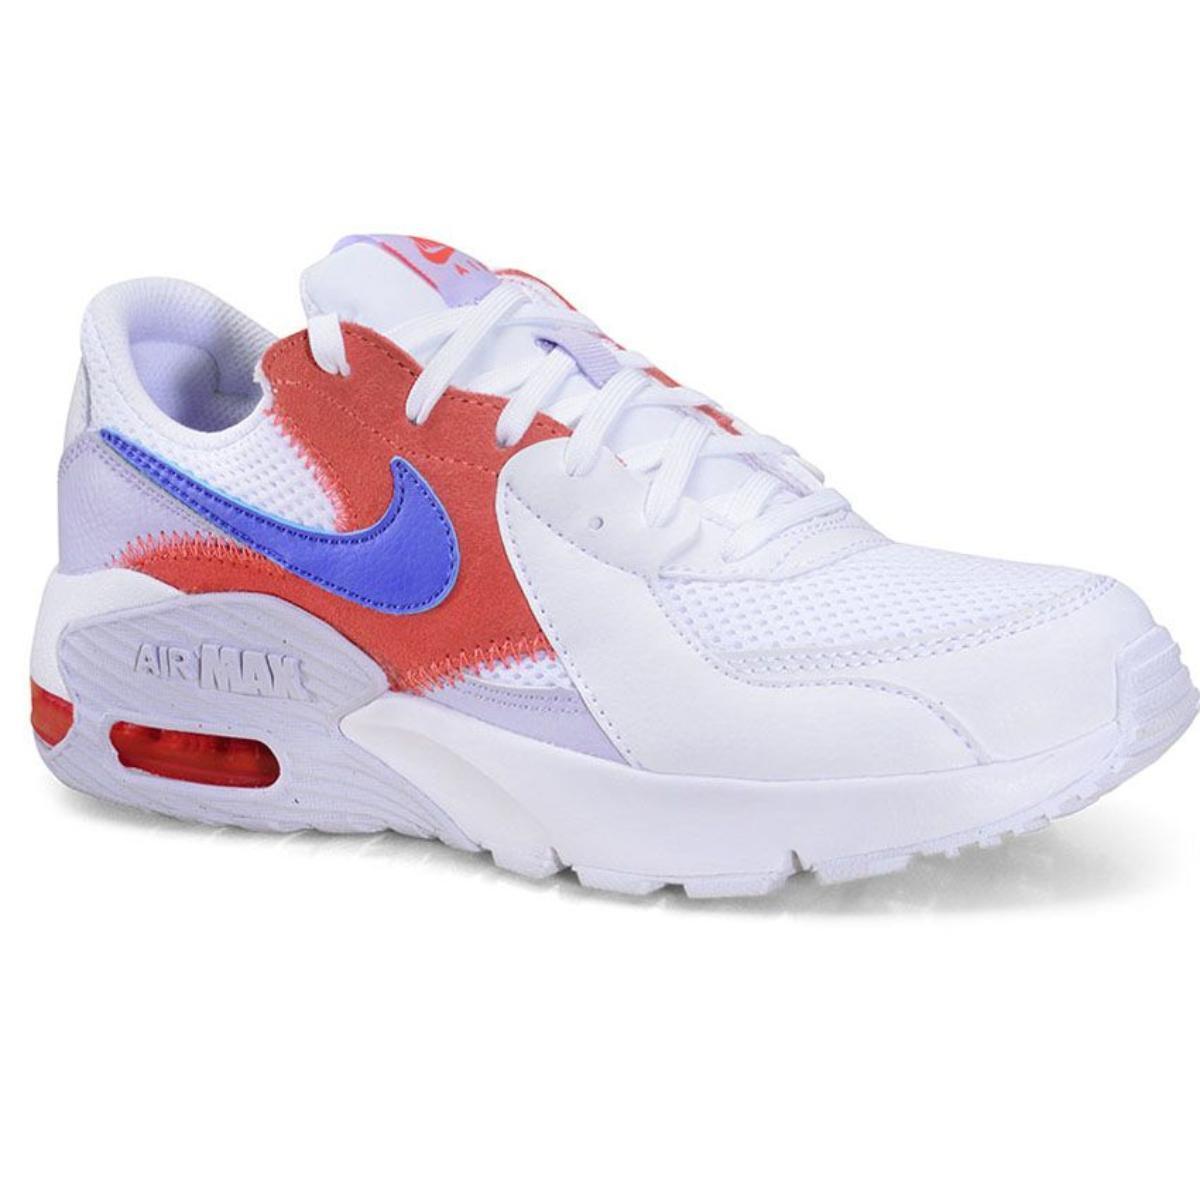 Tênis Feminino Nike Cd5432-115 Air Max Branco/lilas/cereja